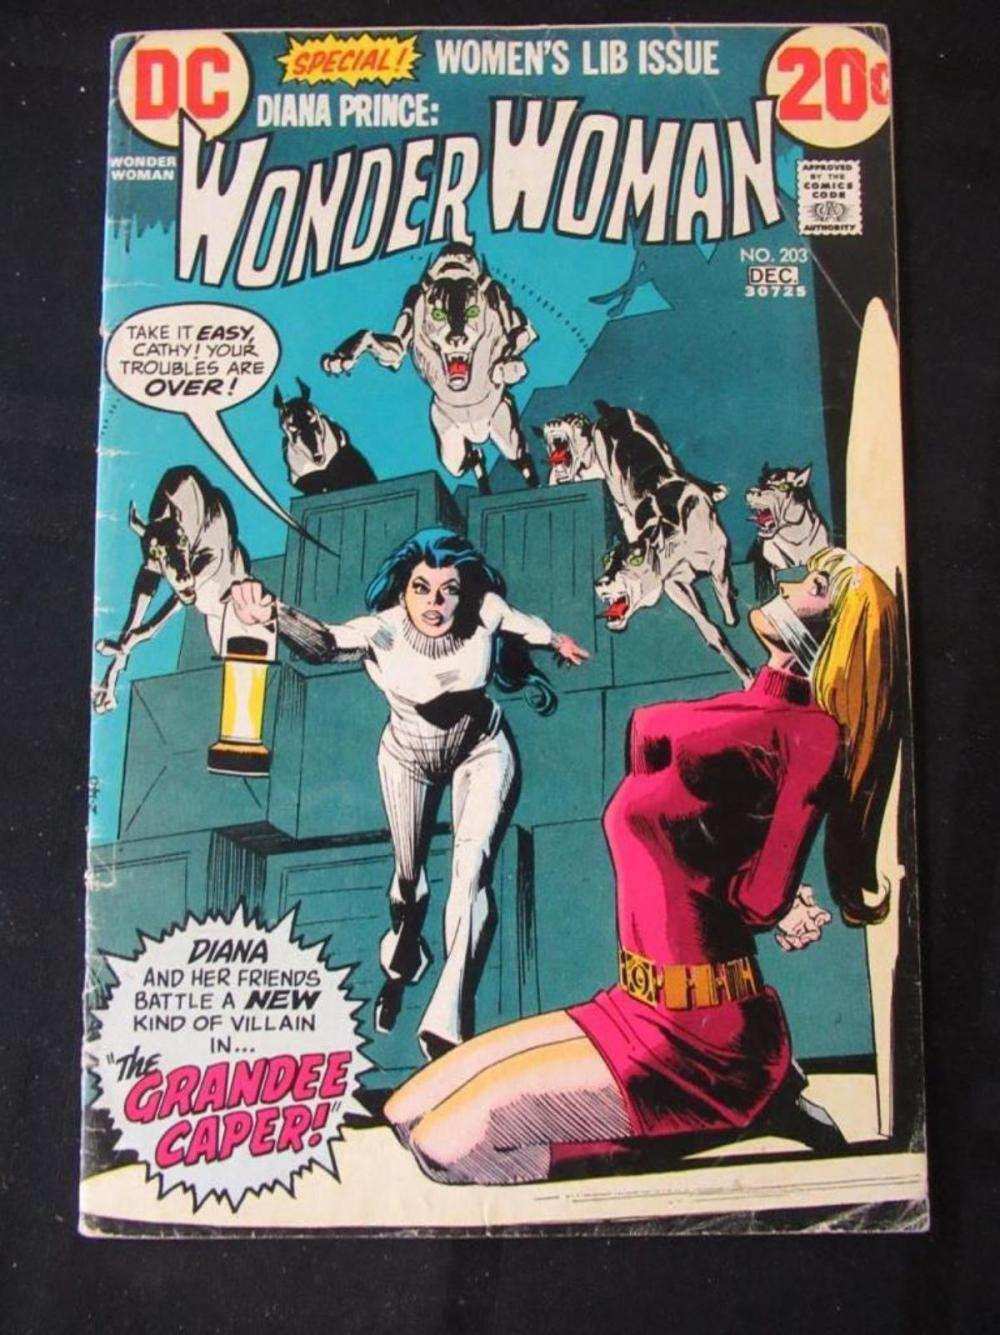 Diana Prince wonder Woman 20c #203 Grandee Caper